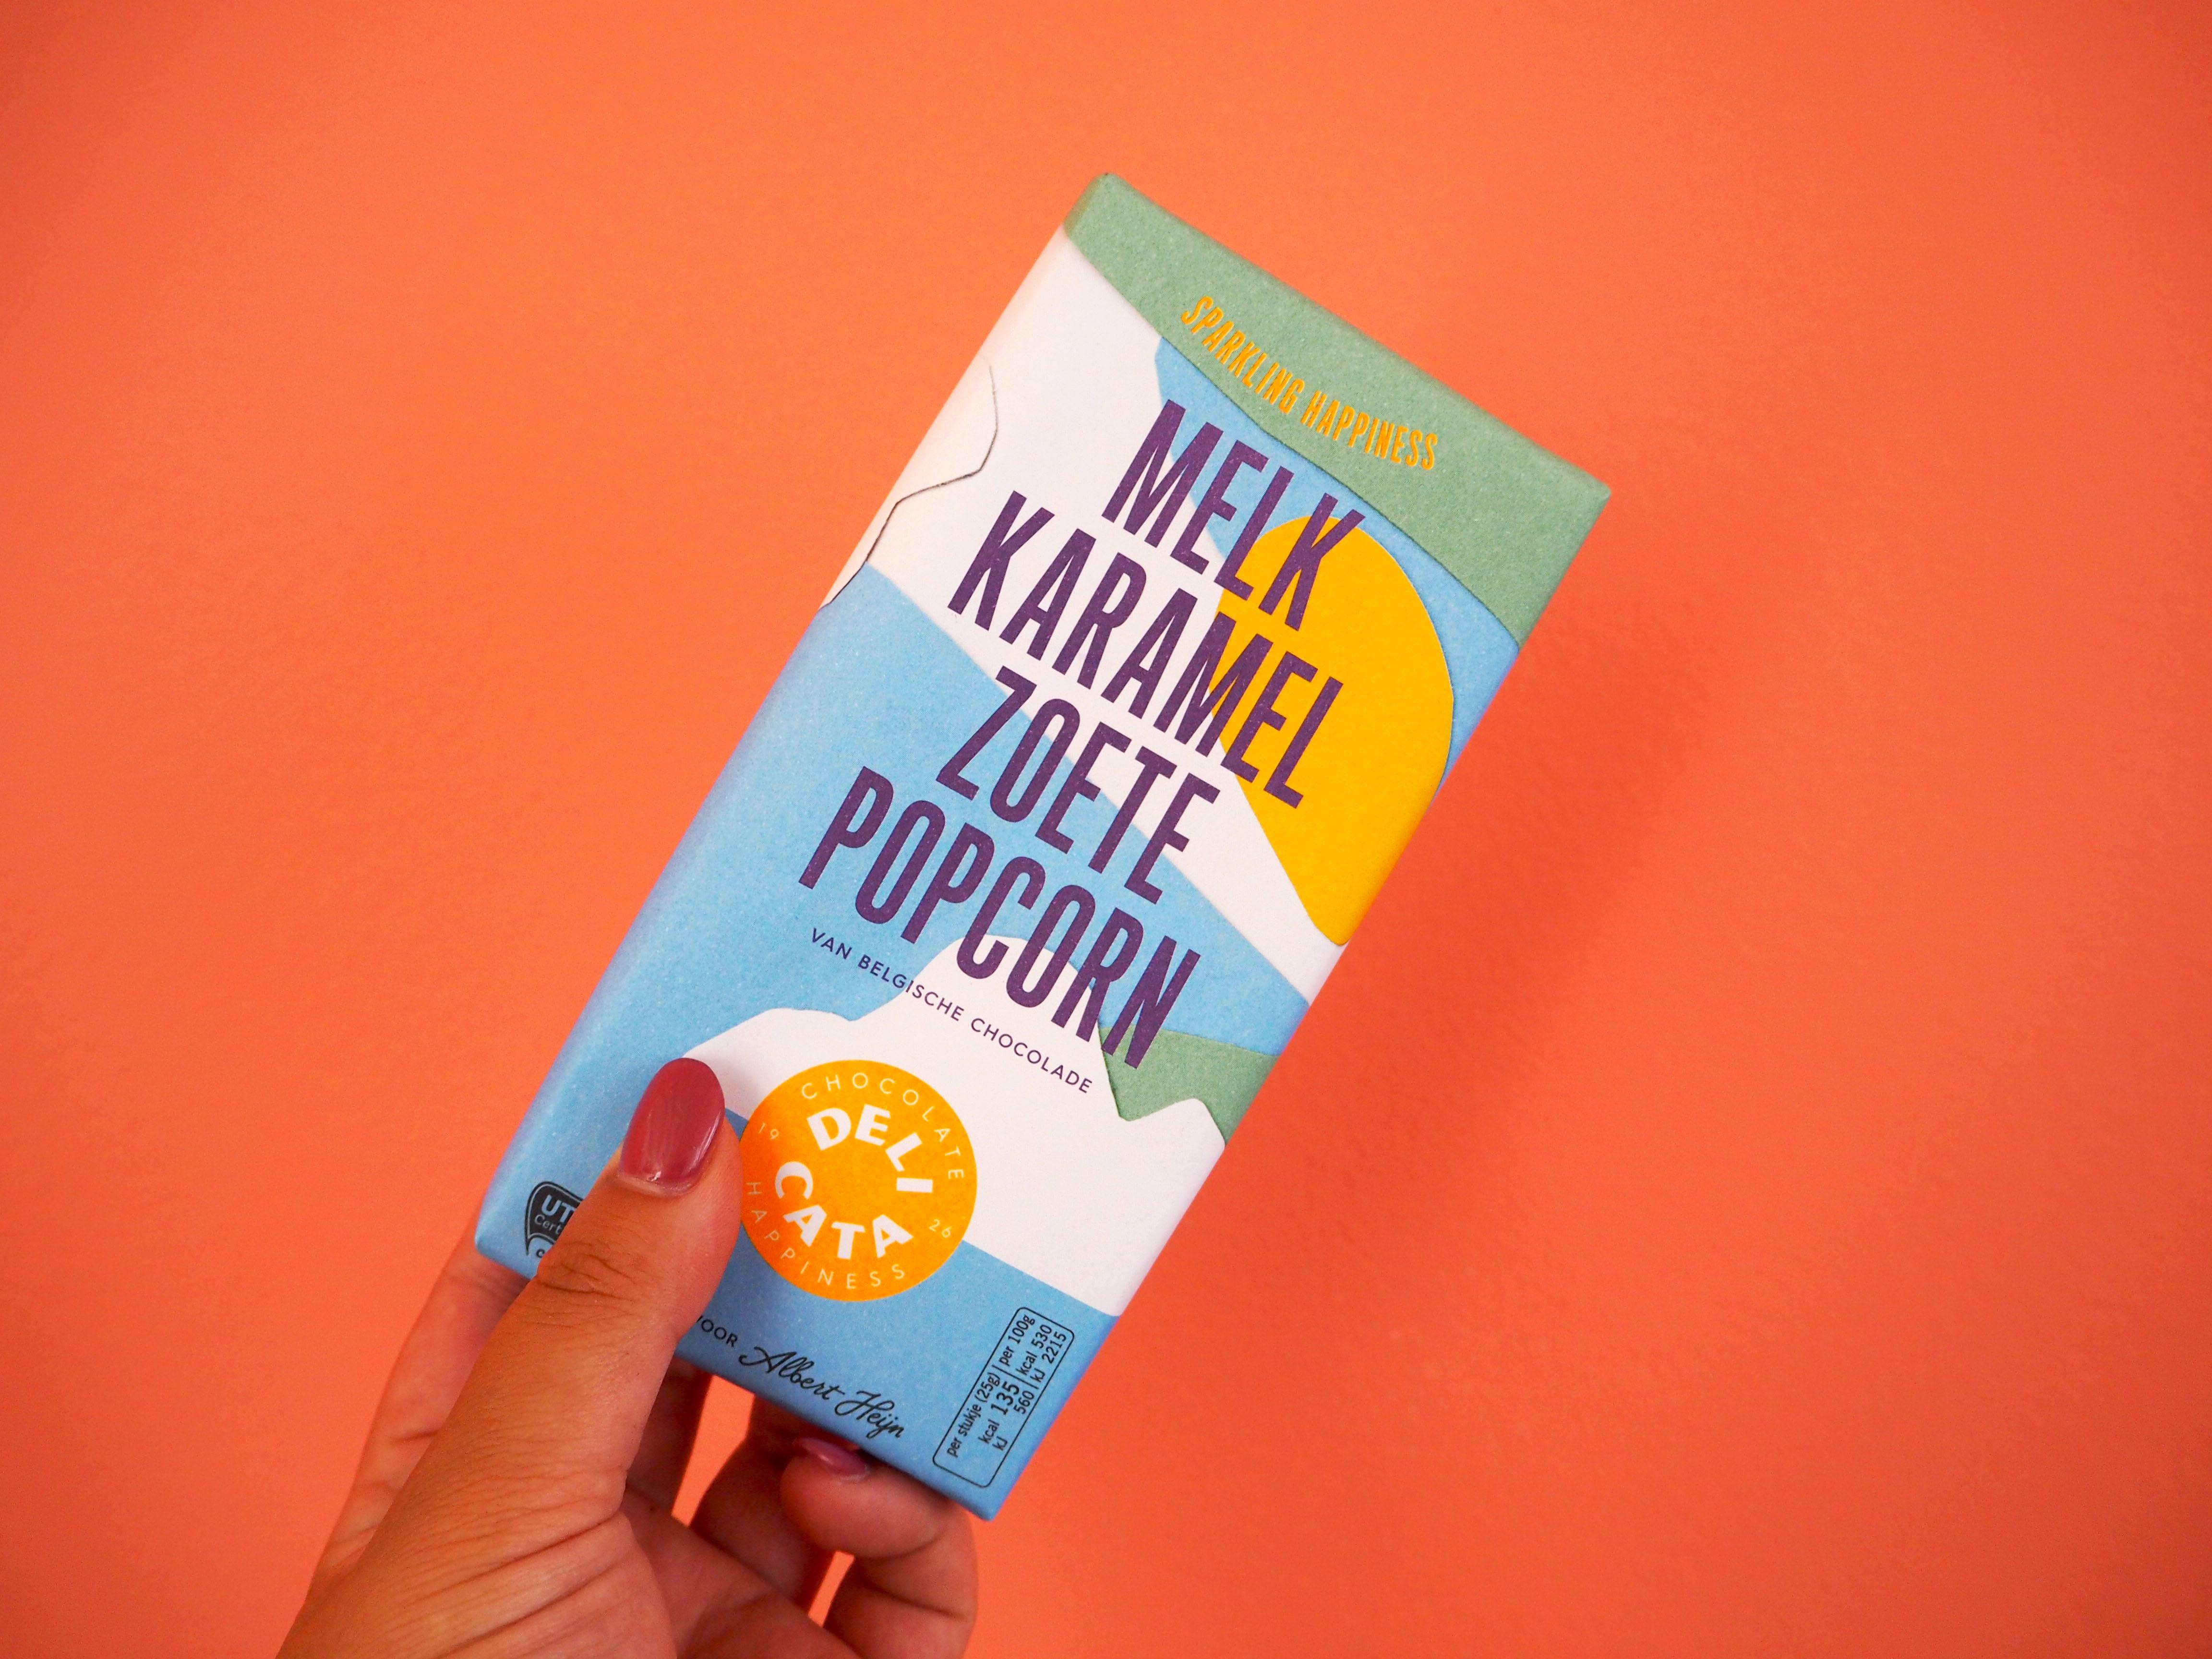 delicata melk karamel zoete popcorn chocolade